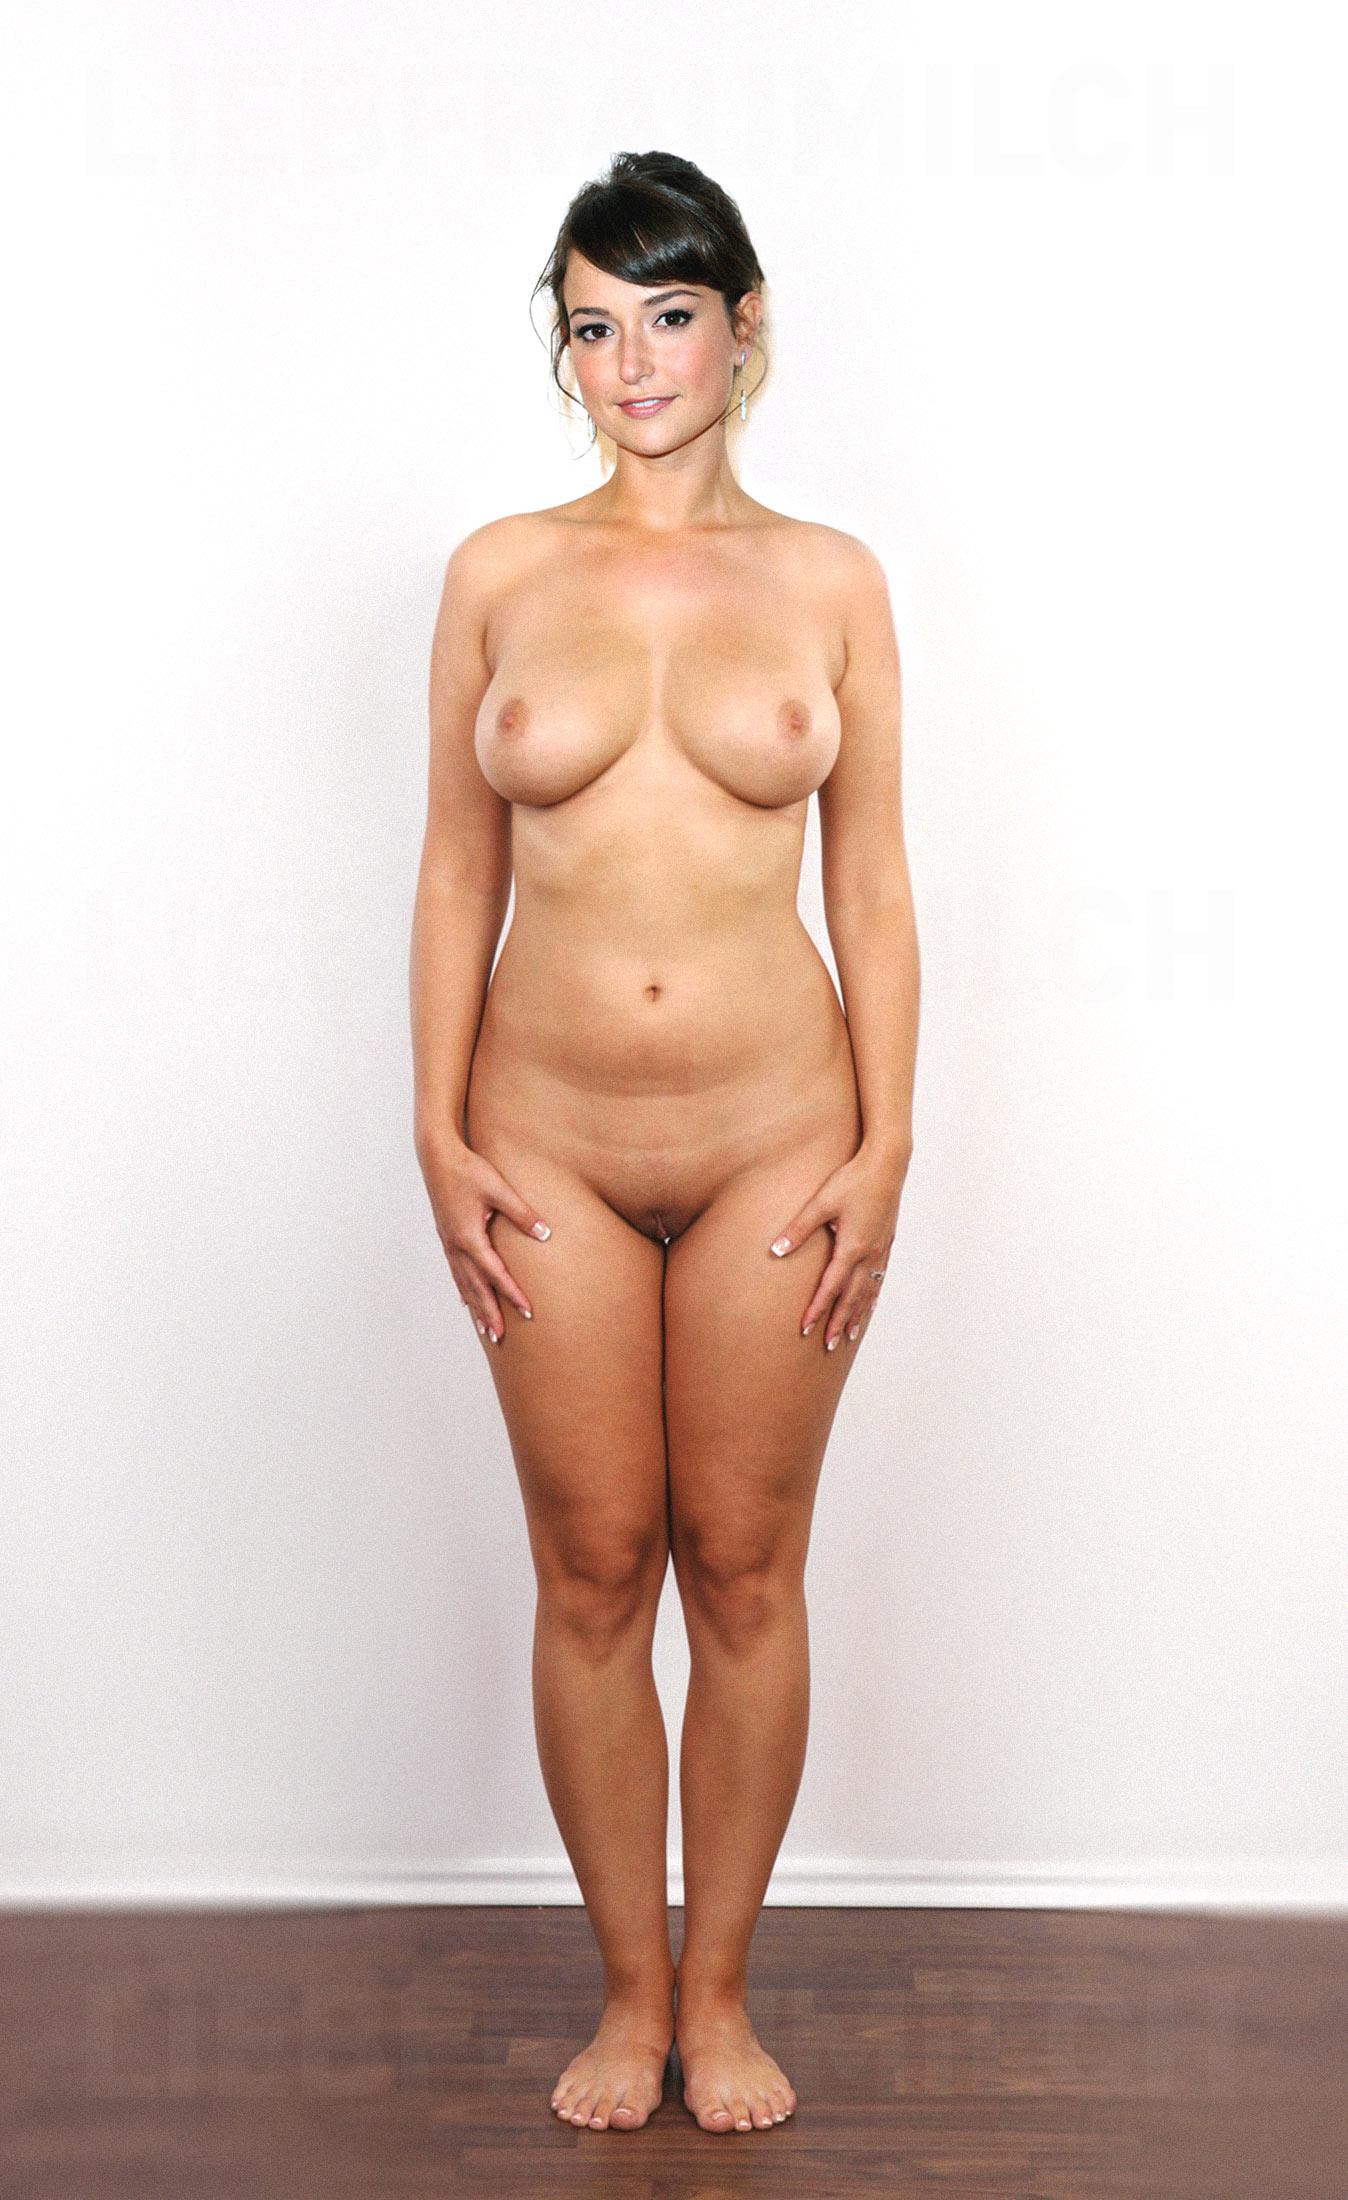 Milana vayntrub ever been nude